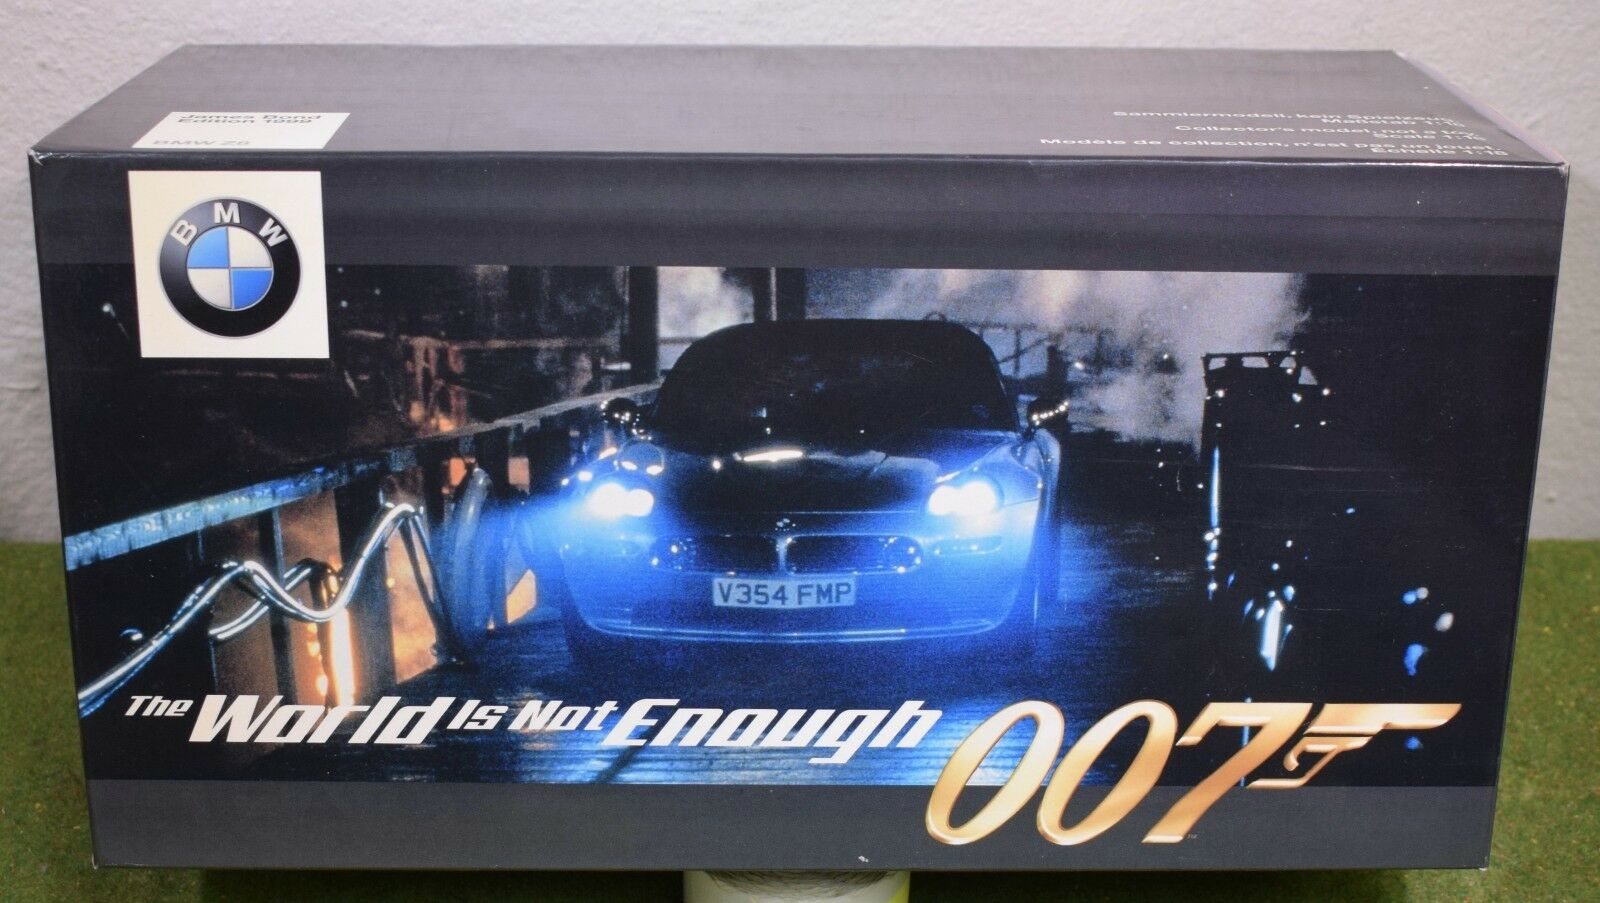 James Bond 007 SCALA 1:18 IL MONDO NON BASTA james bond EDITION BMW Z8